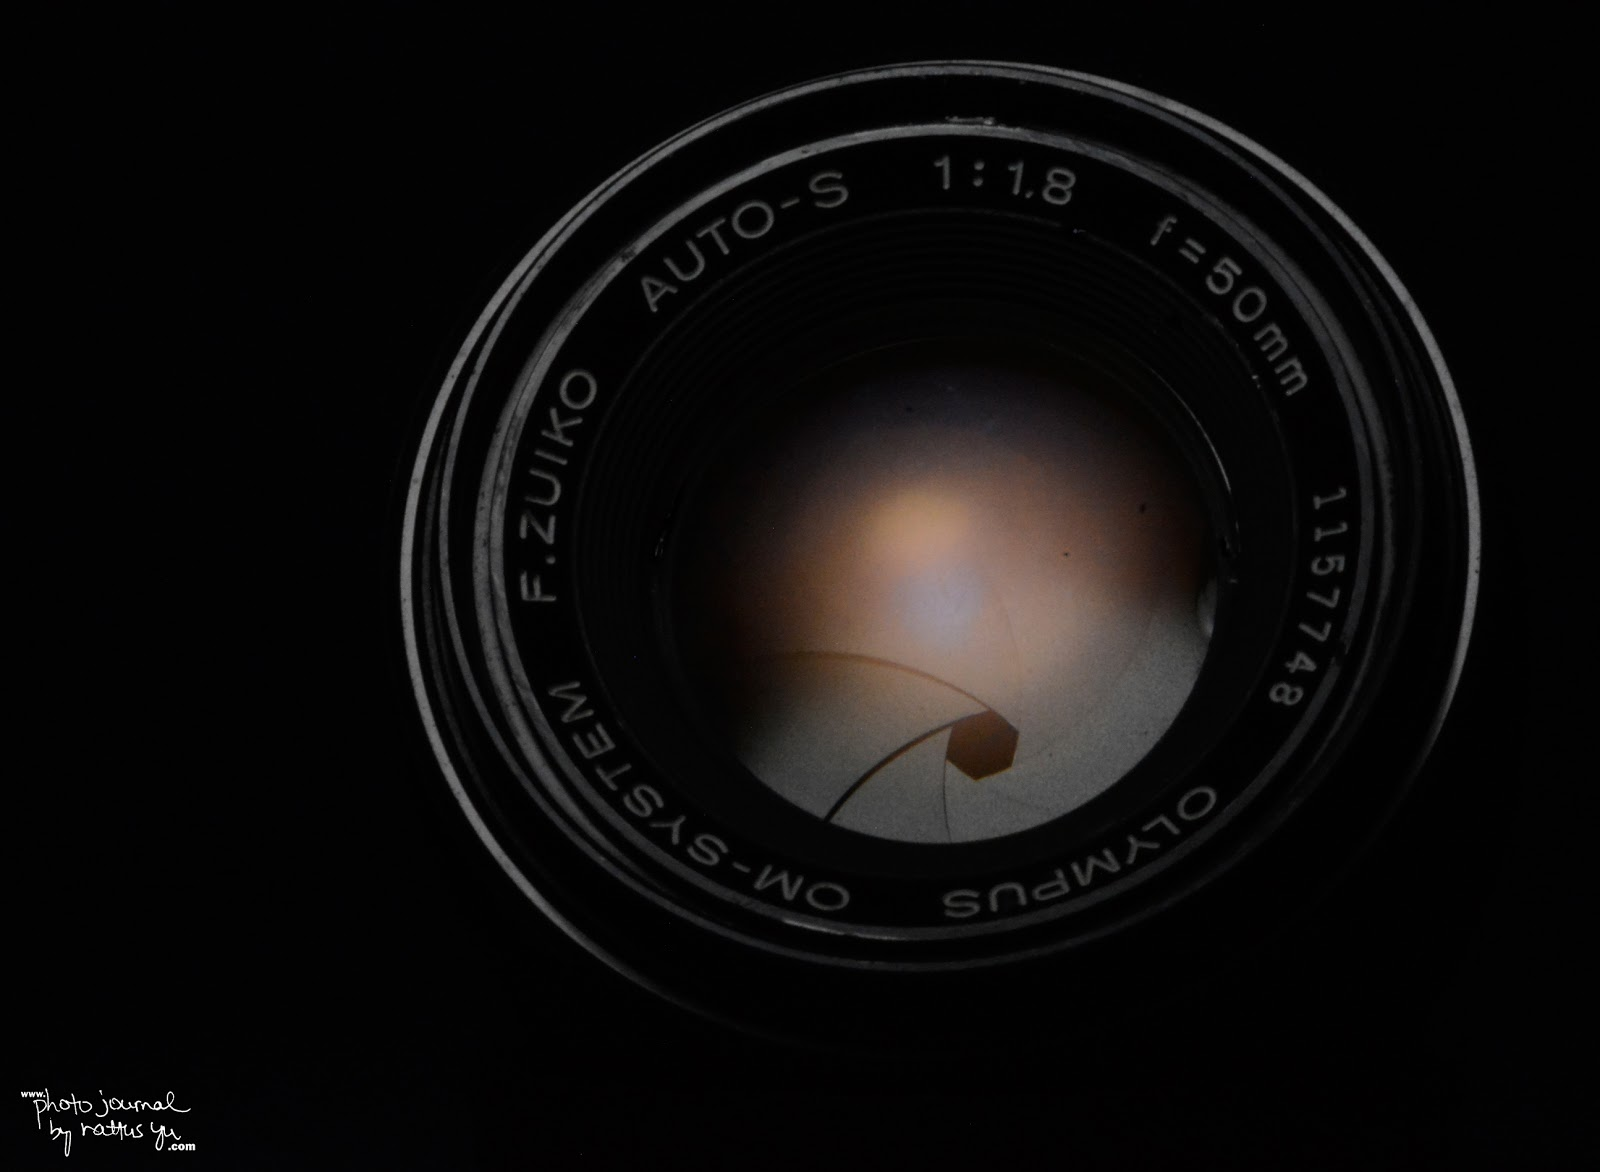 Olympus F.Zuiko Auto-S 50mm f/1.8 (Converted to Nikon Mount!)